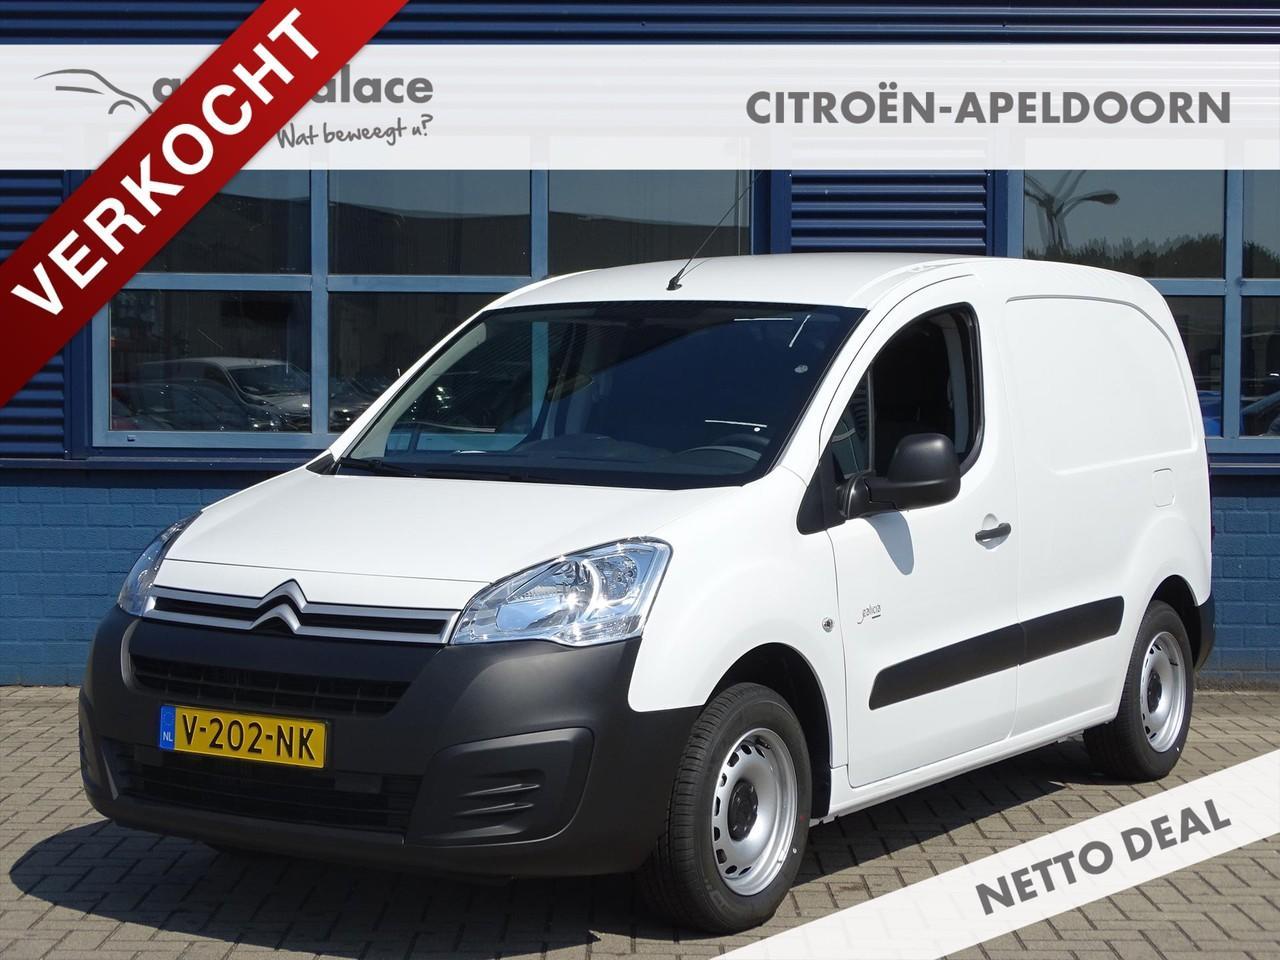 Citroën Berlingo Gb 1.6 bluehdi 75pk 2pl club economy